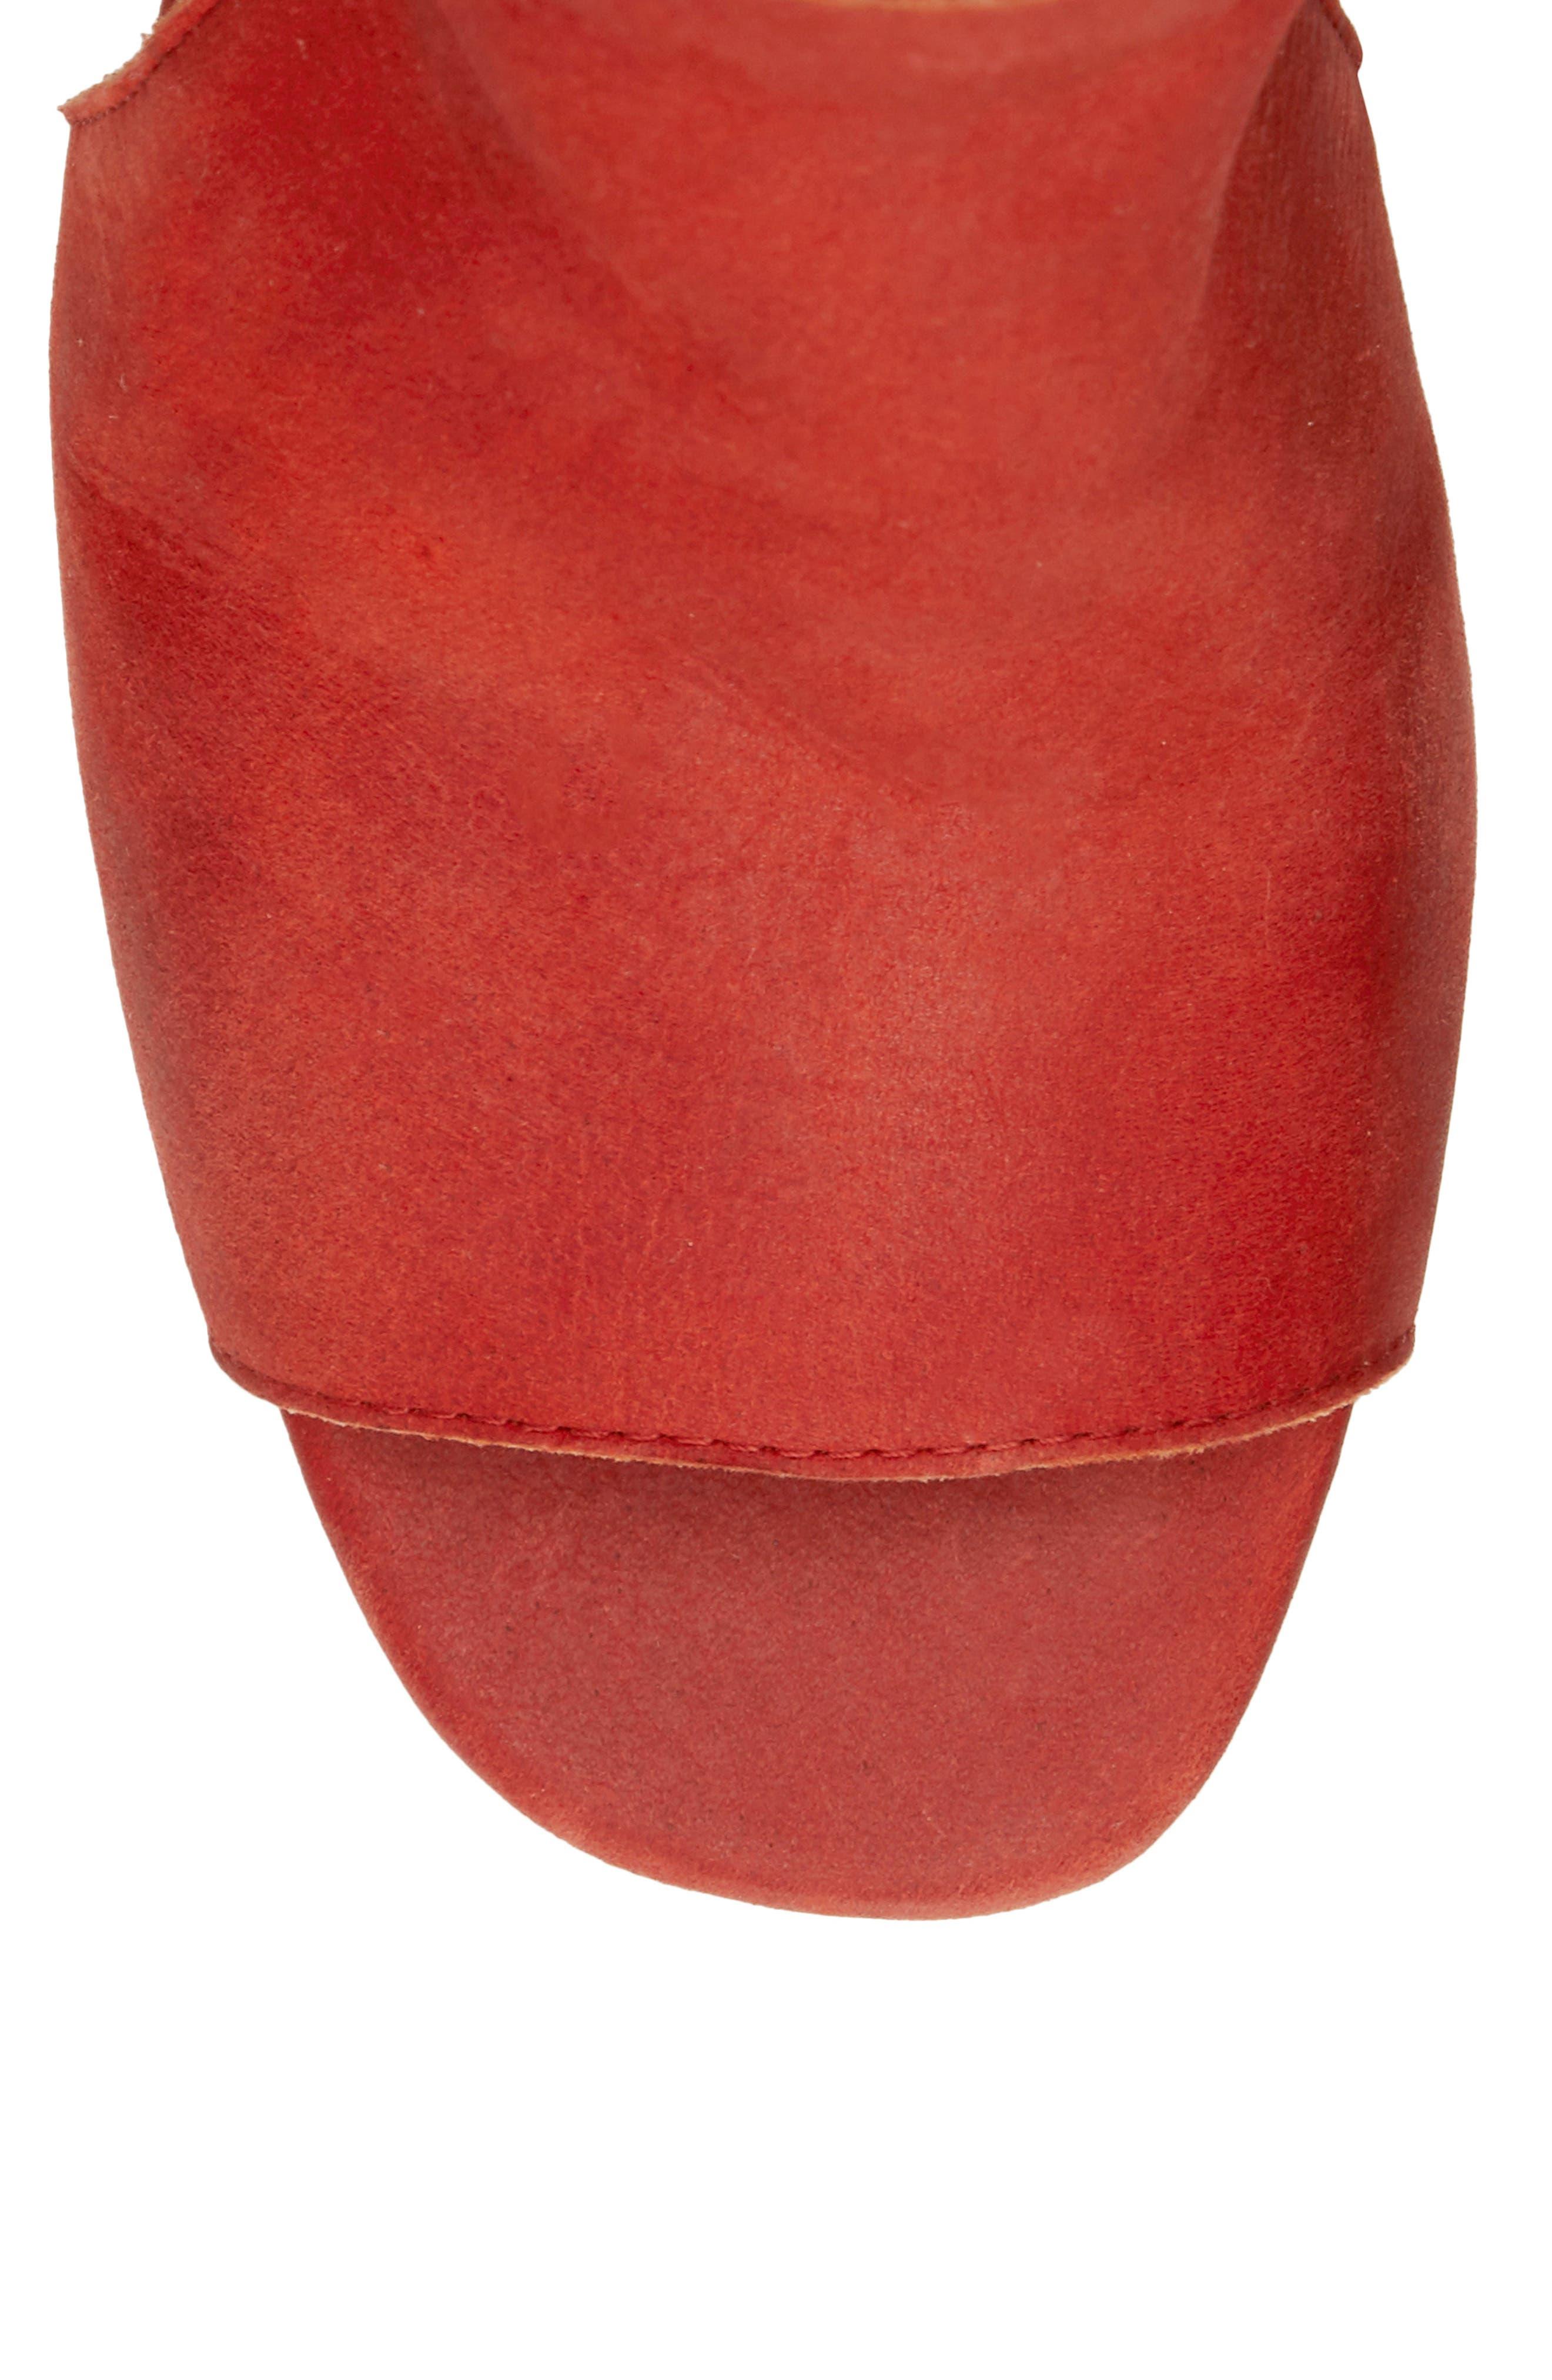 Udine Shield Sandal,                             Alternate thumbnail 8, color,                             TANDORI LEATHER